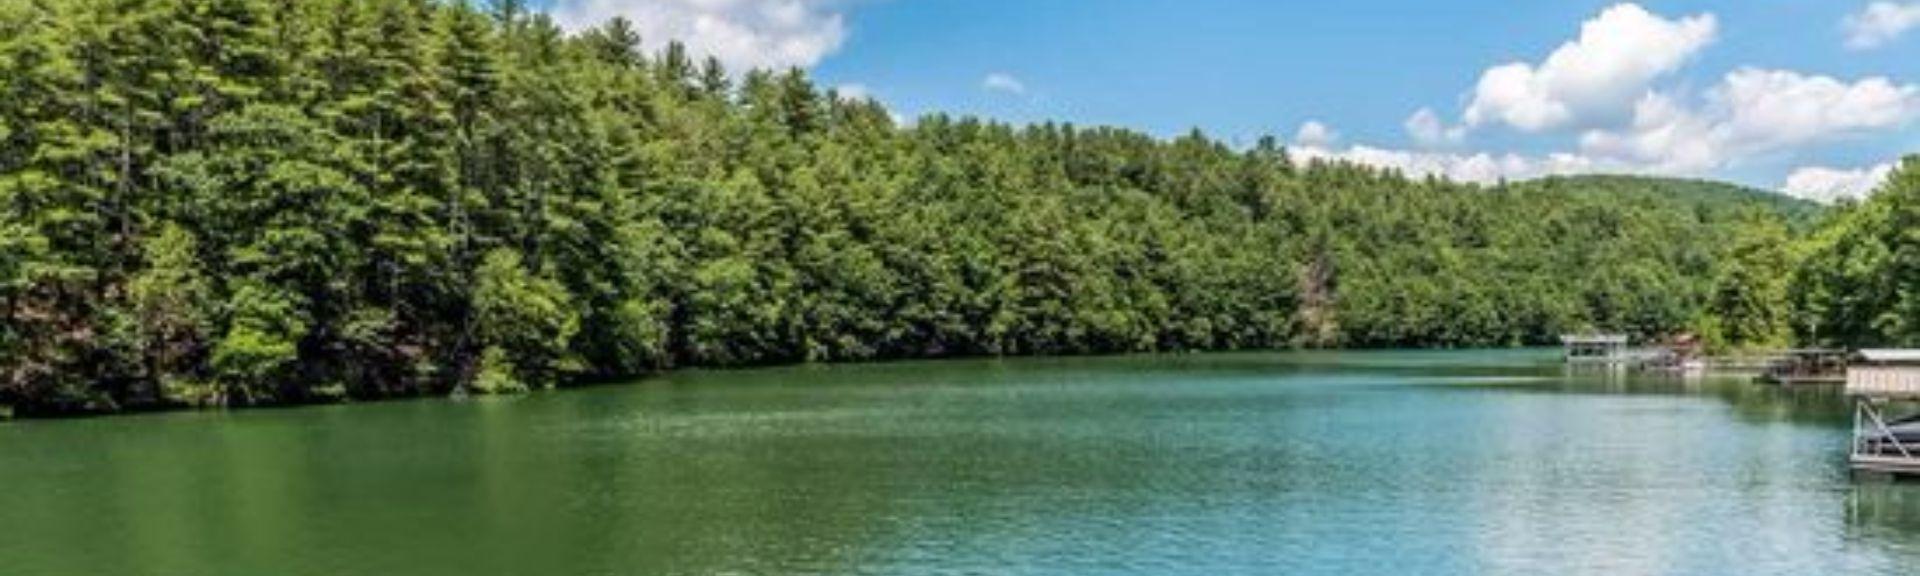 North Georgia Mountains, Georgia, Estados Unidos